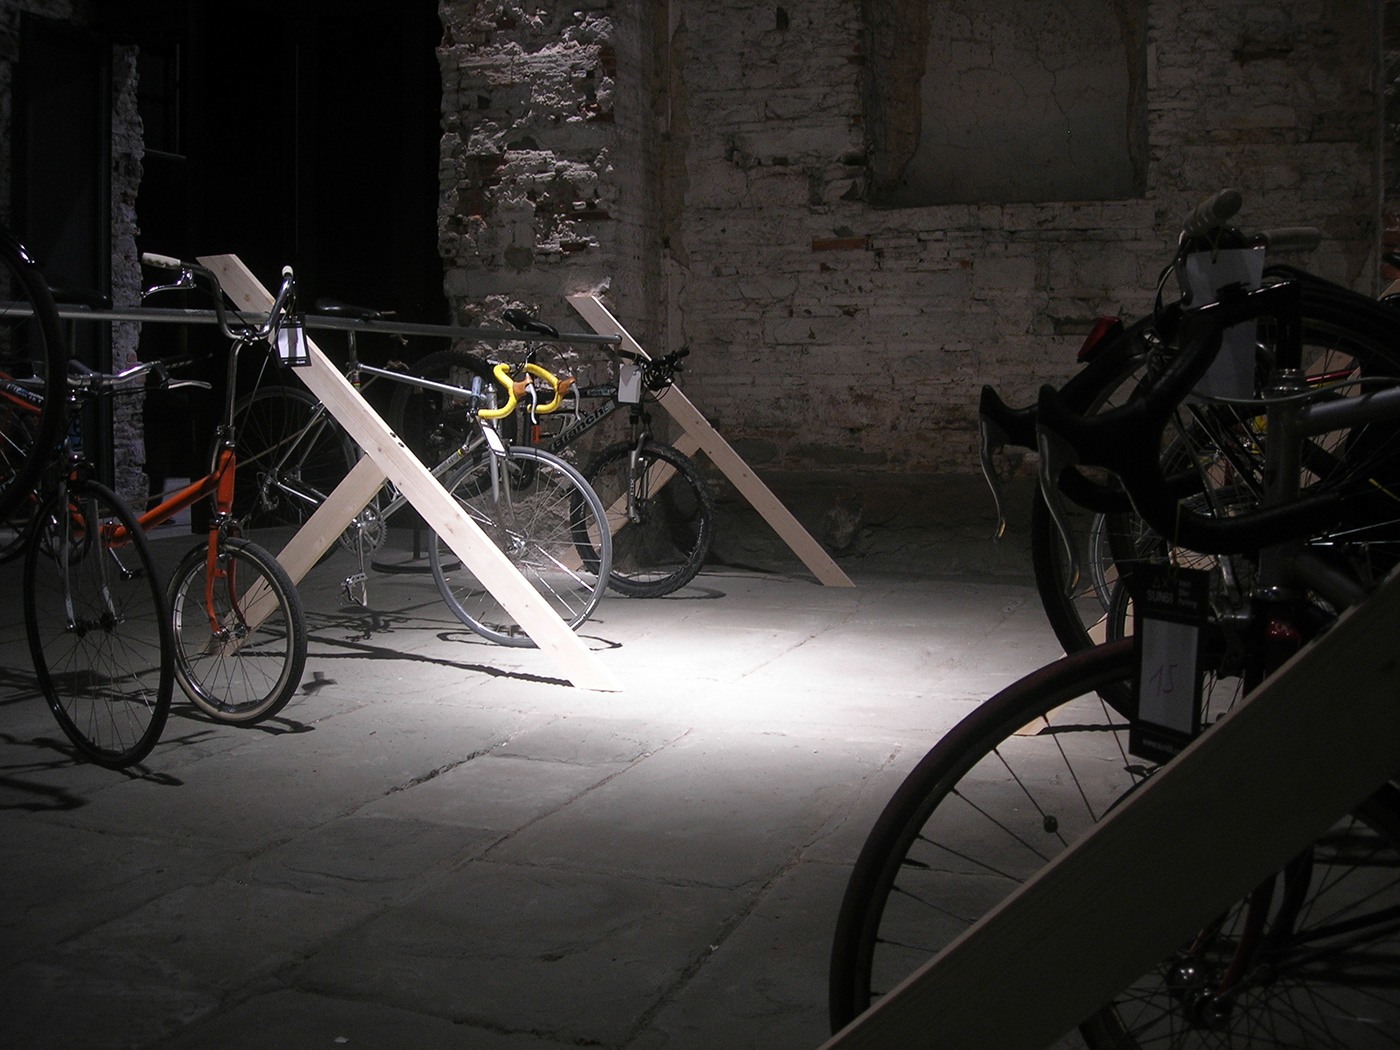 bycicle film festival design EXHIBIT DESIGN Florence milan SUN68 The Studio